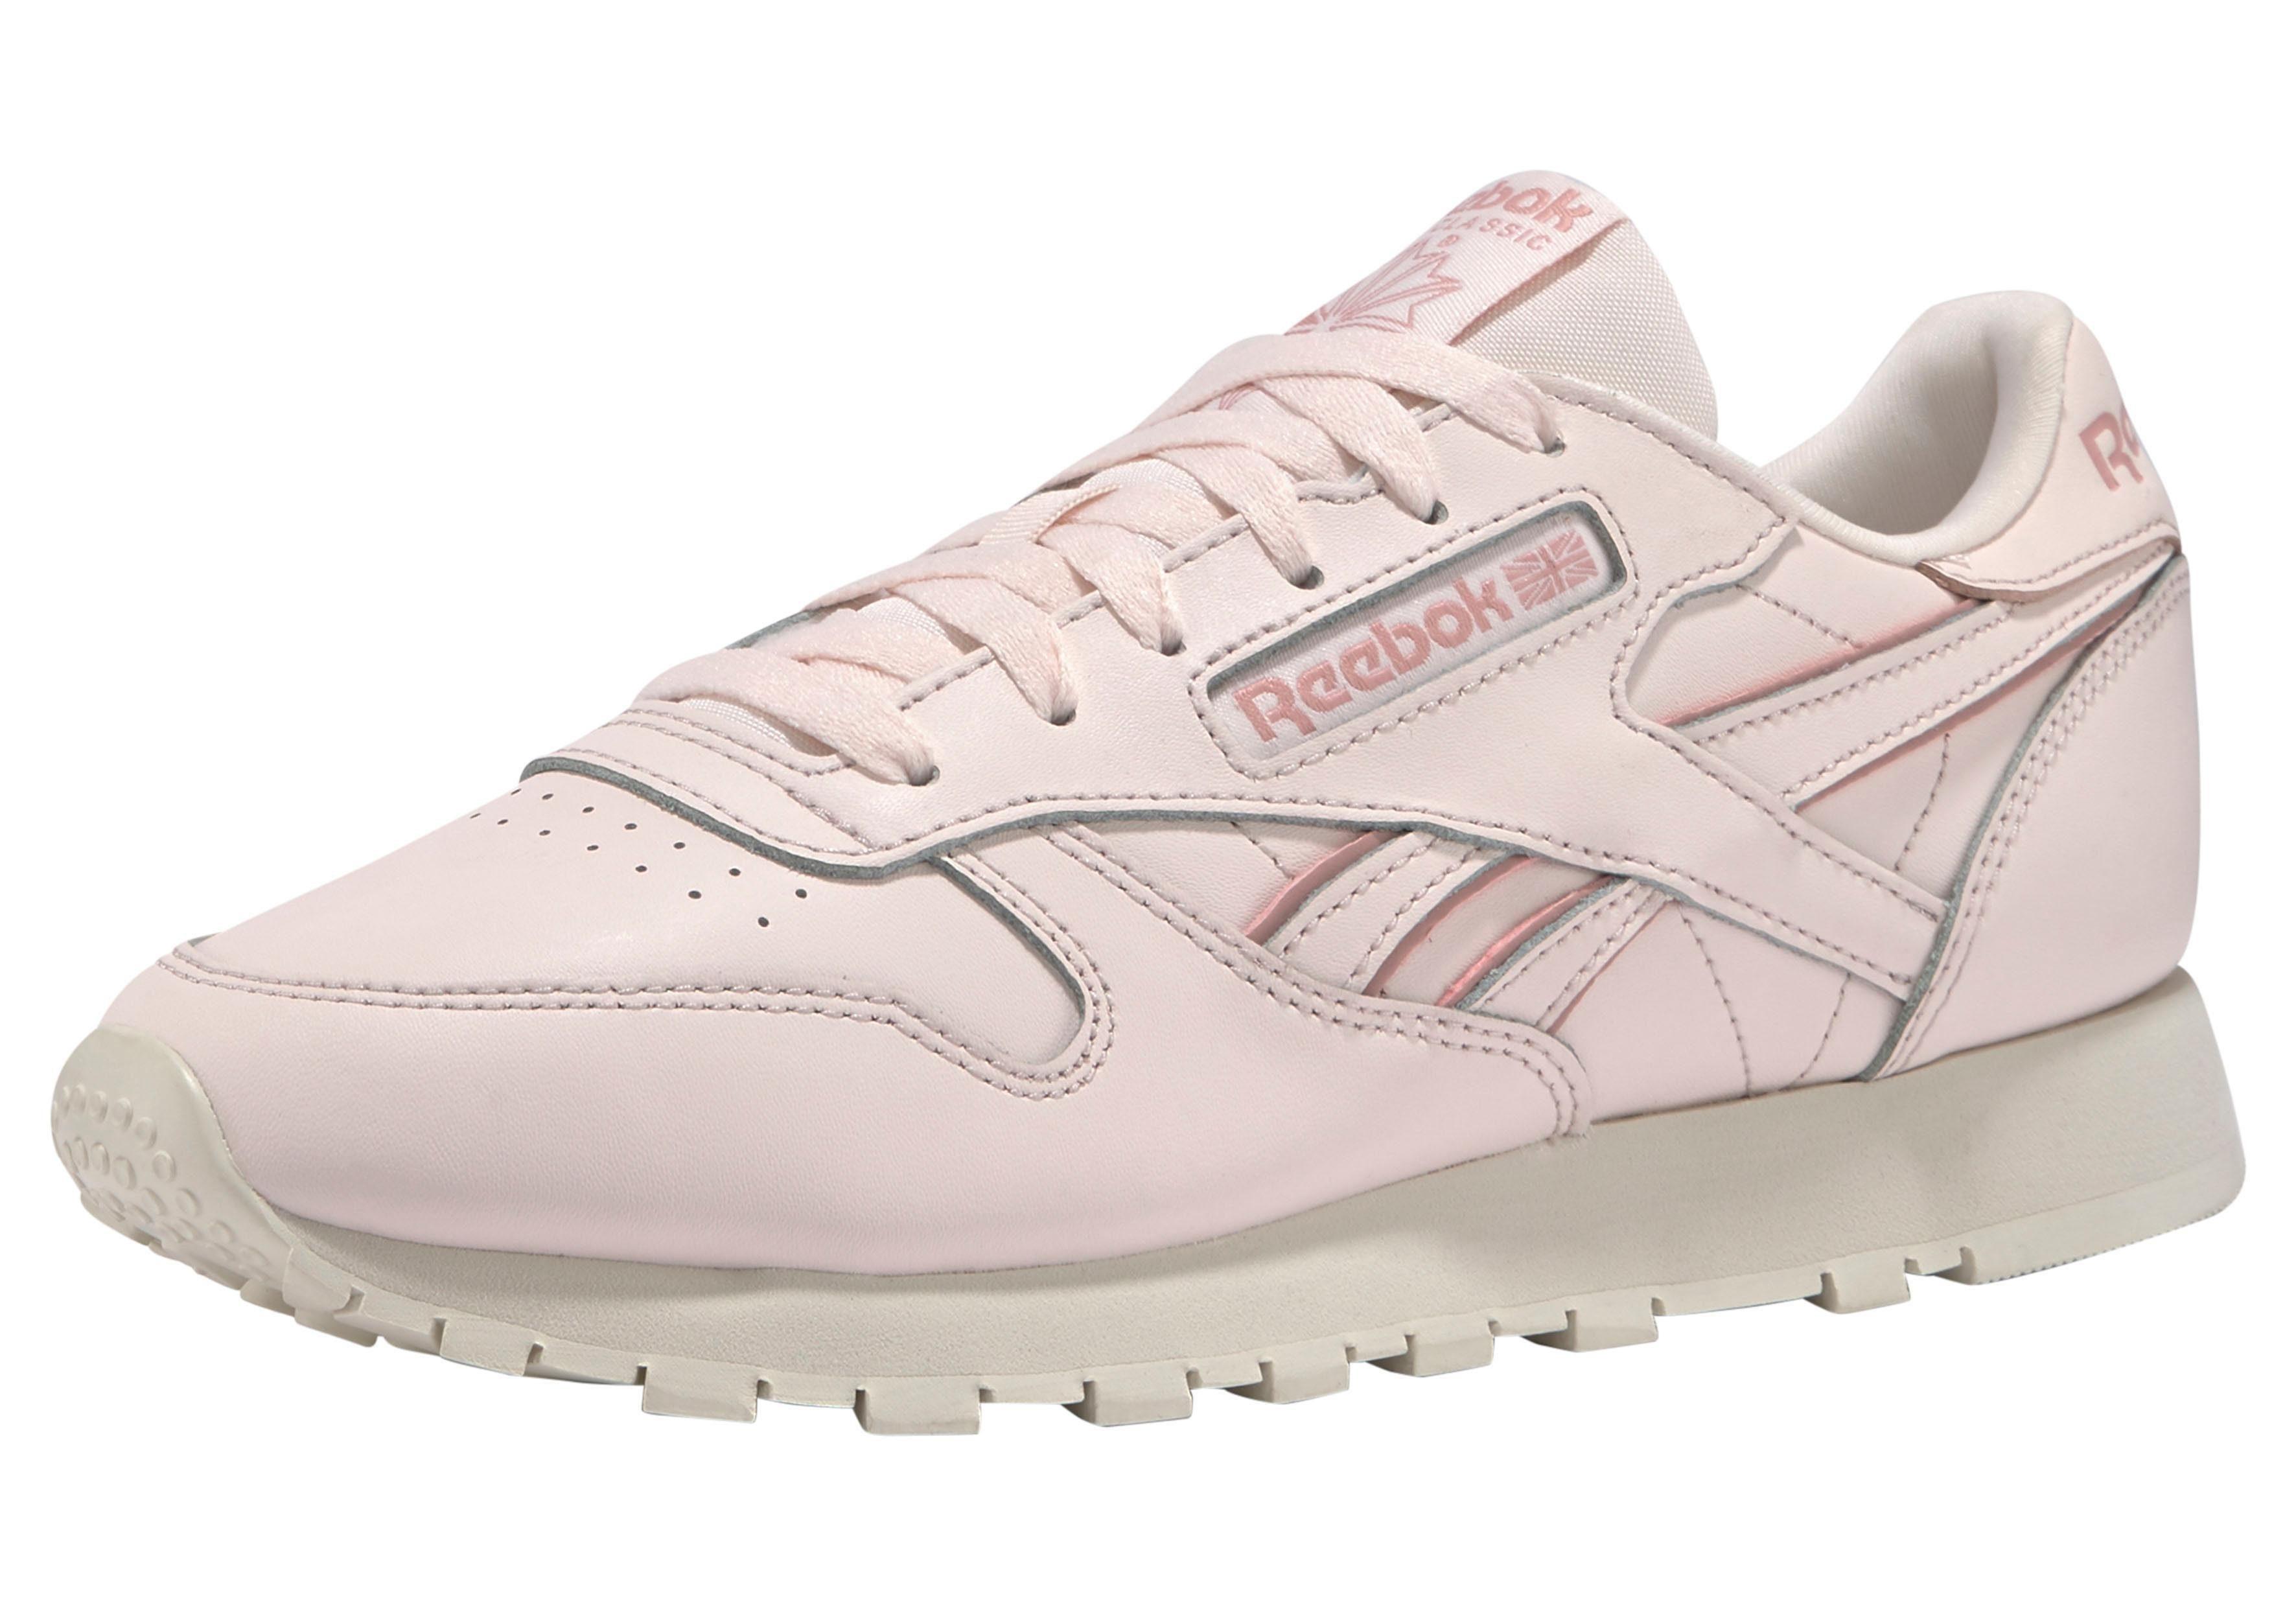 Reebok Classic »Classic Leather« Sneaker kaufen   OTTO